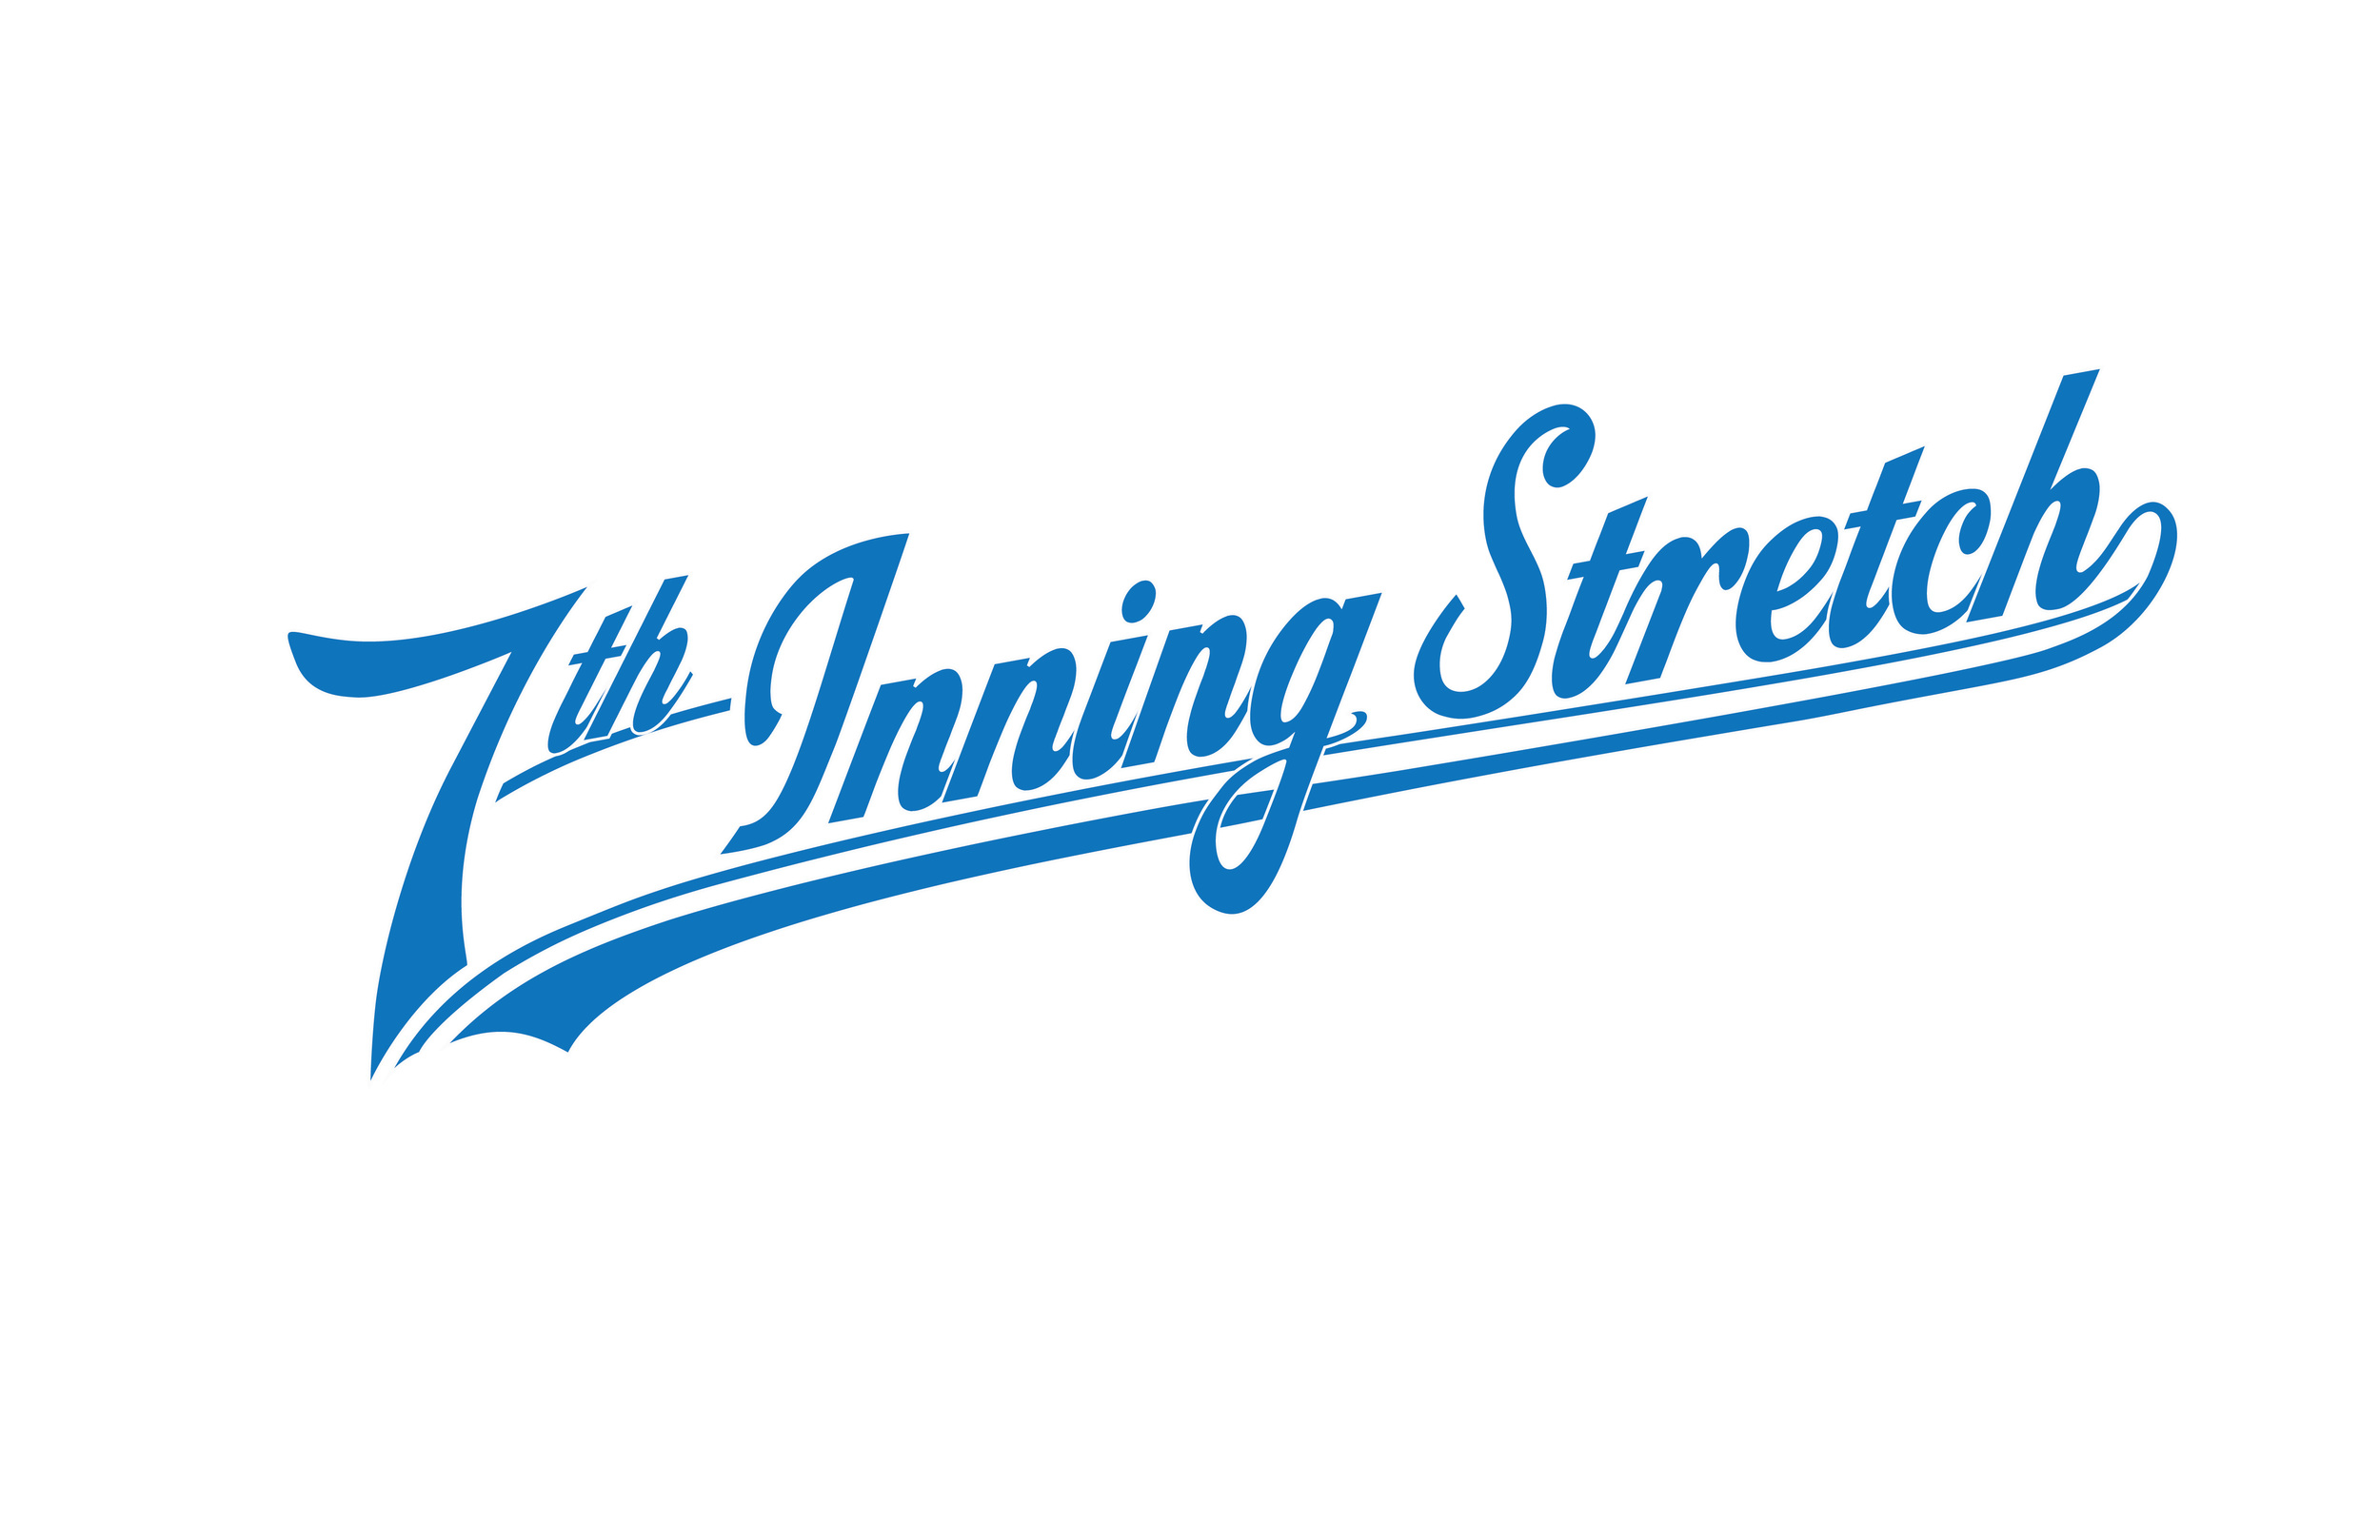 7thInningStretch-FINALLOGO-RBG.jpg